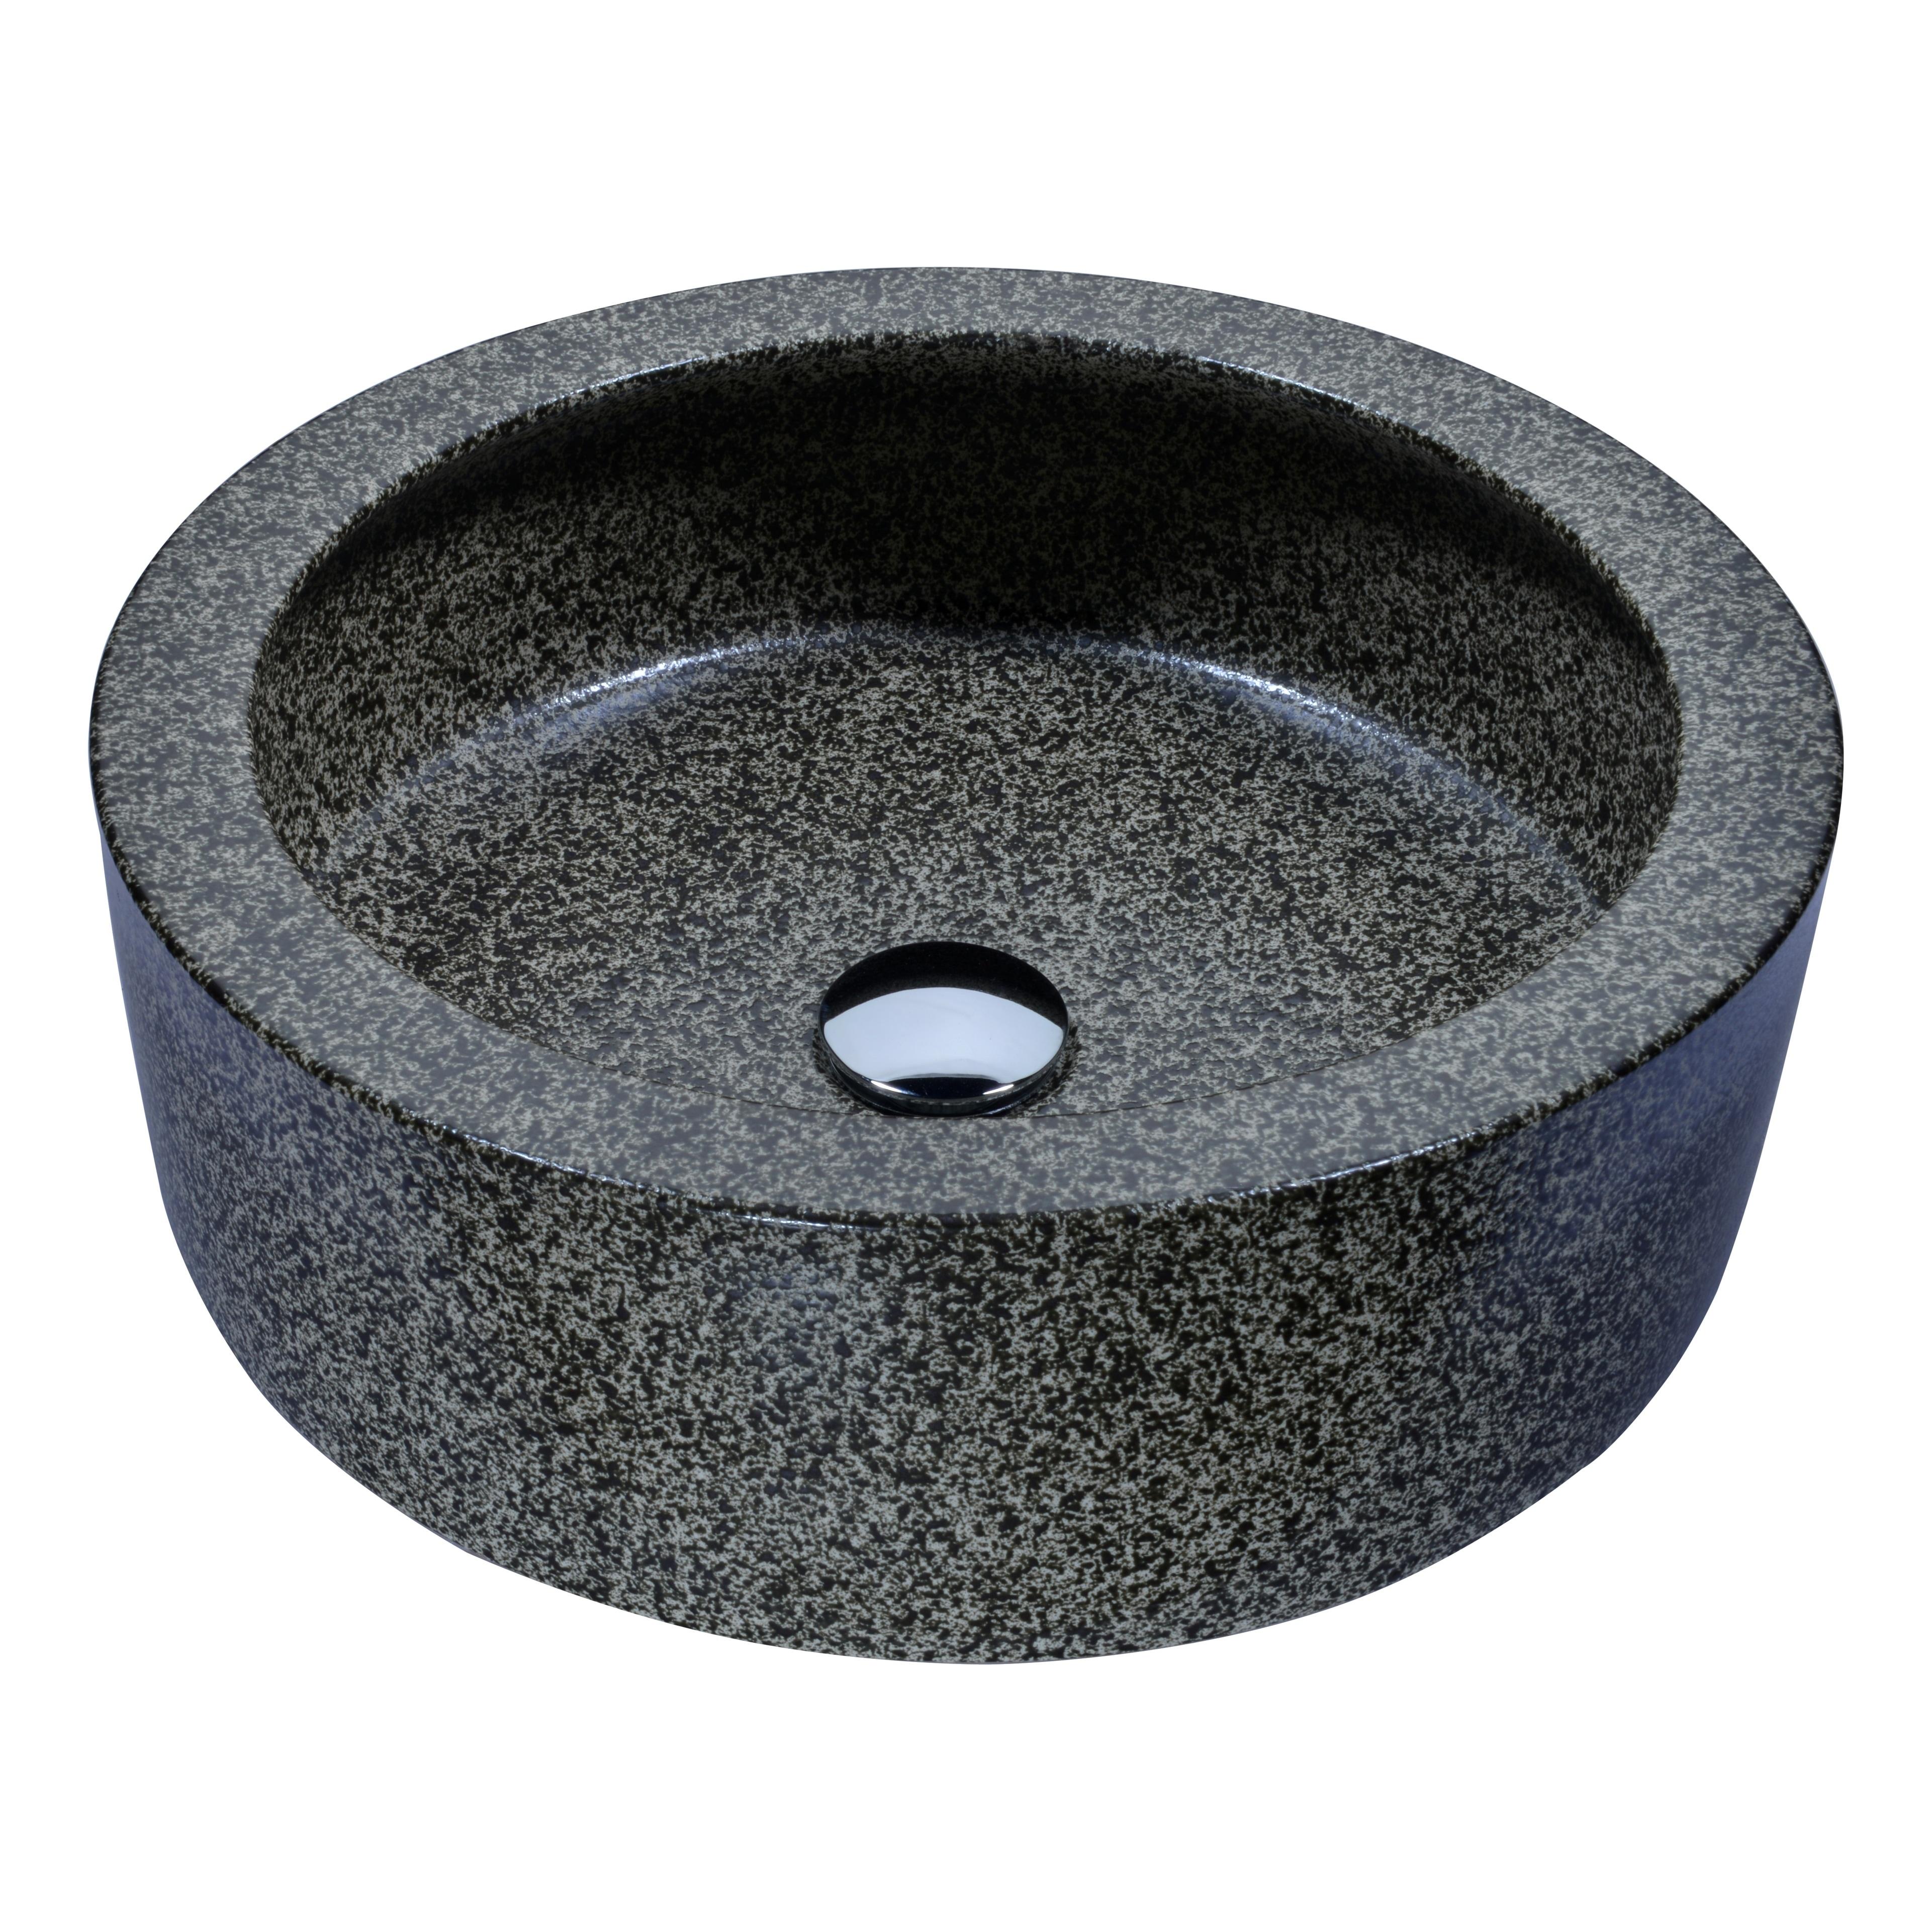 Anzzi Black Desert Crown Vessel Sink in Speckled Stone (S...